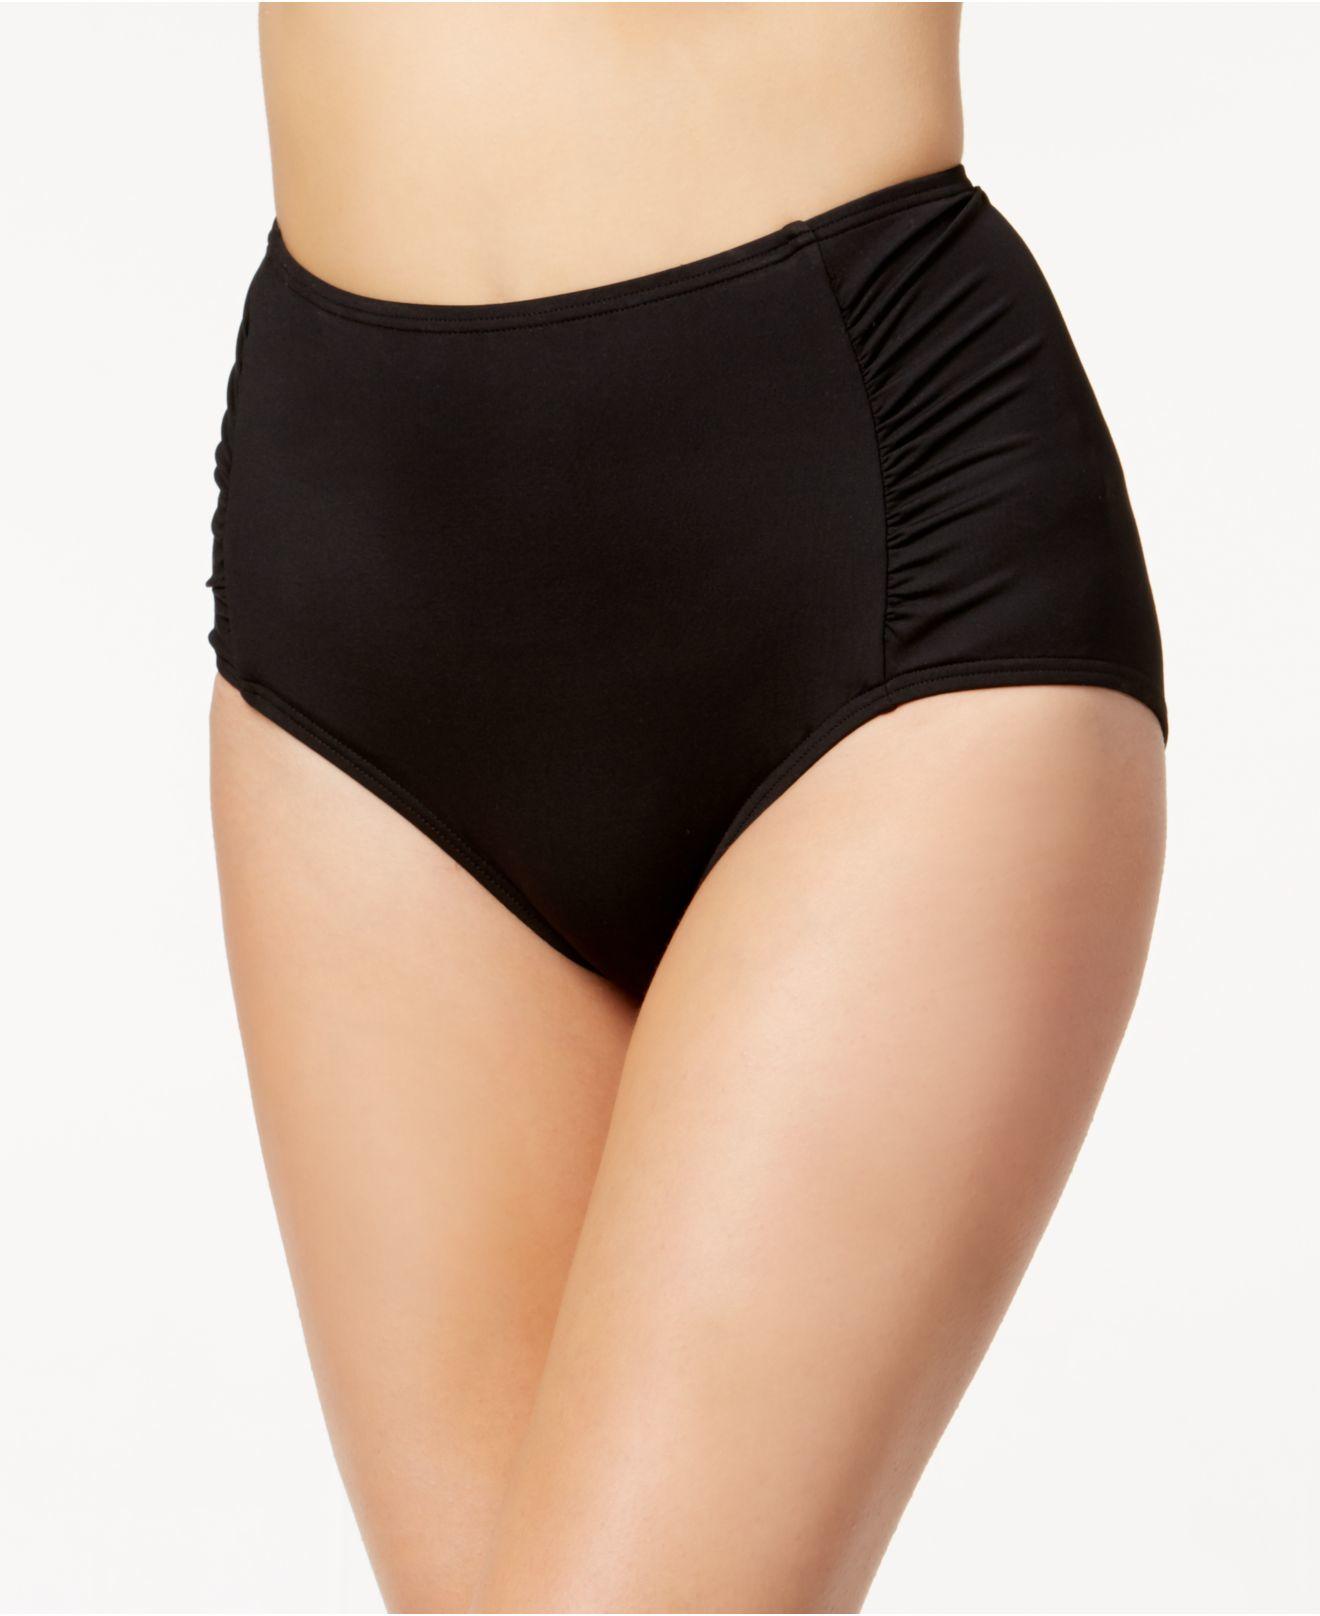 betsey johnson high waist ruched panel swim bottom in black lyst. Black Bedroom Furniture Sets. Home Design Ideas